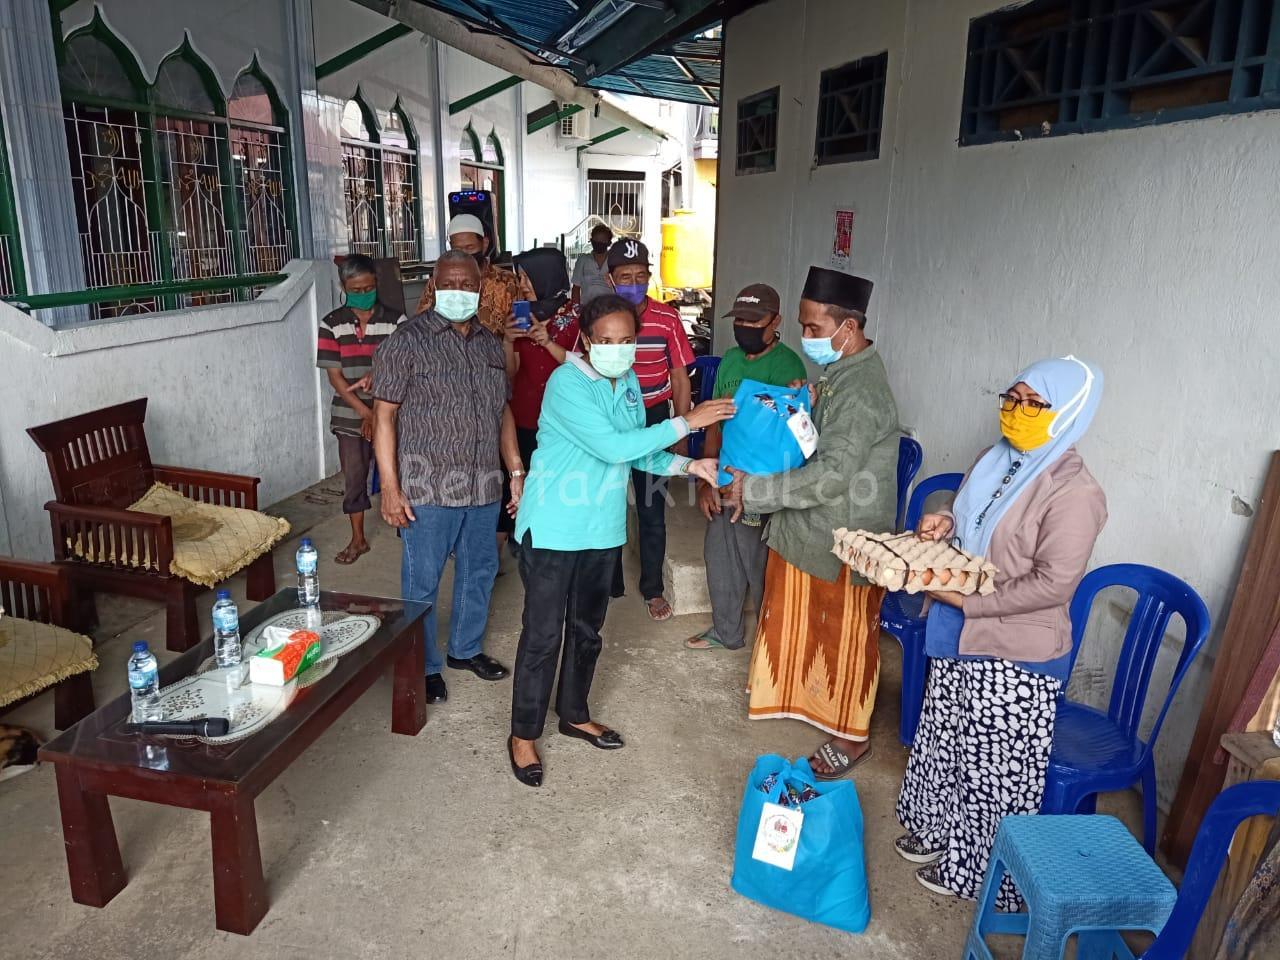 Lagi, Keluarga Mandacan -Kiriweno Serahkan 521 Paket Bama ke Ratusan Umat di Manokwari 1 IMG 20200418 WA0035